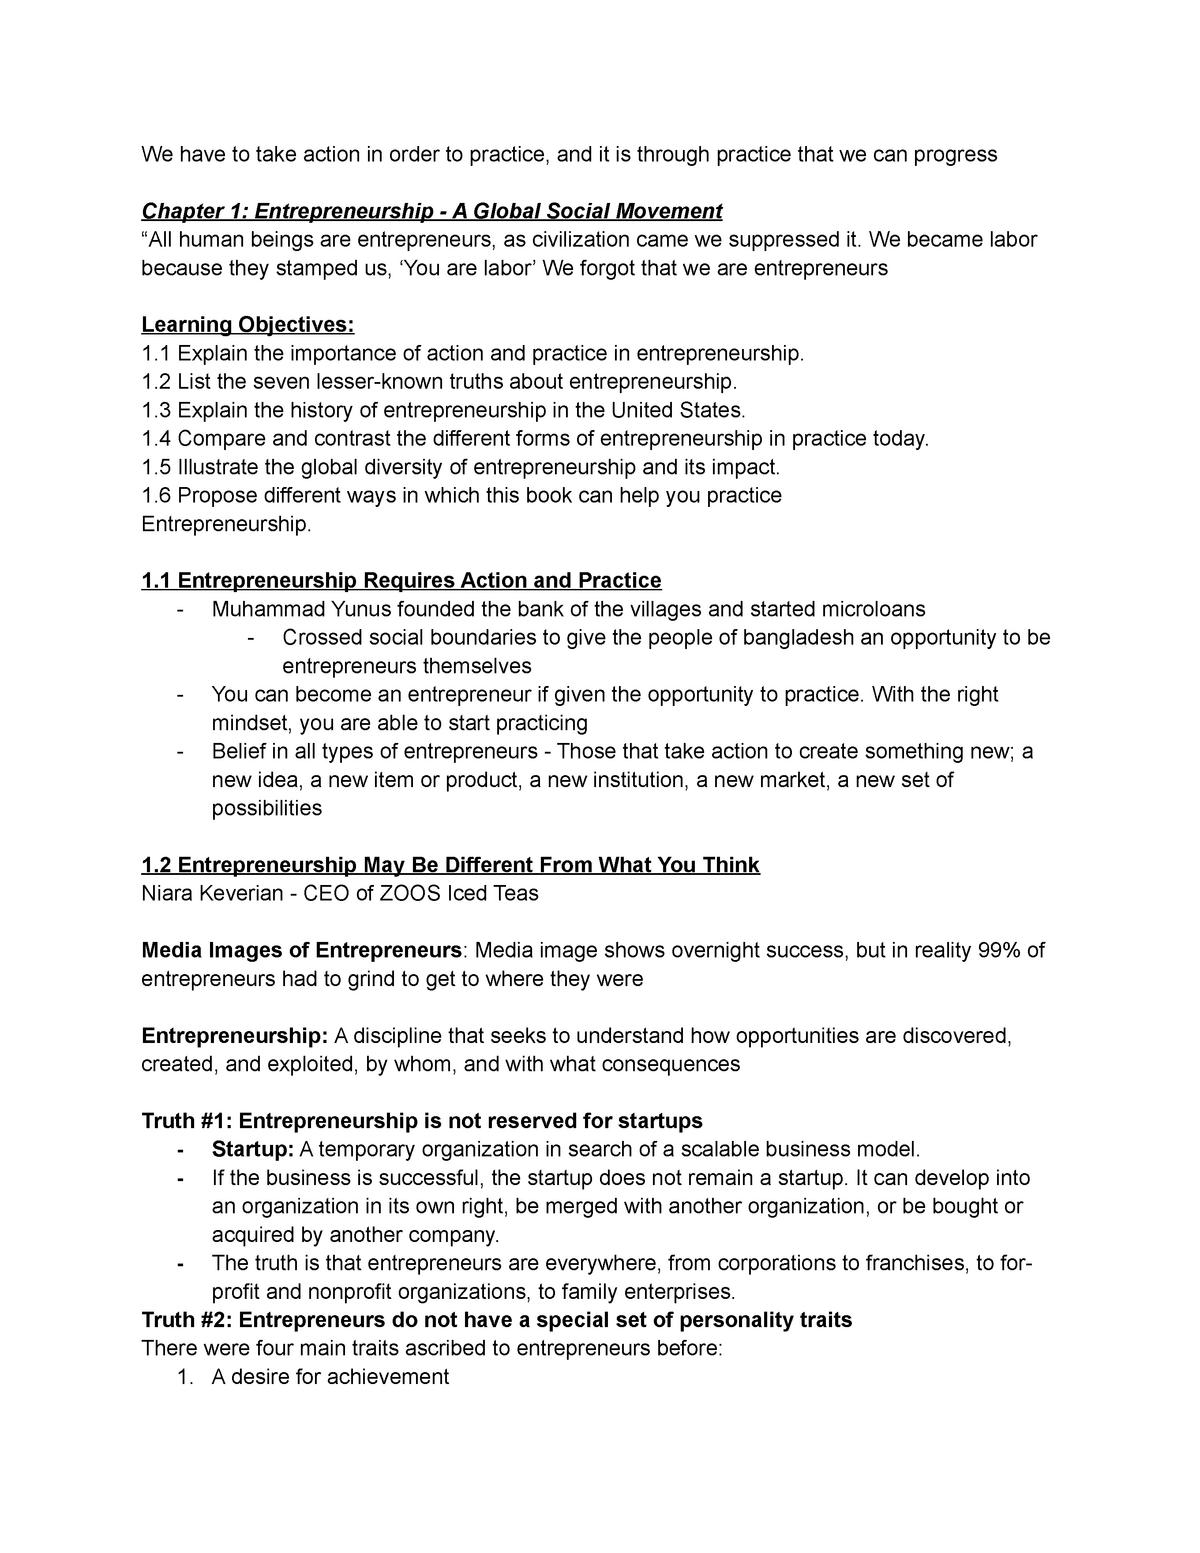 Chapter One Notes - MGT3064 - Virginia Tech - StuDocu